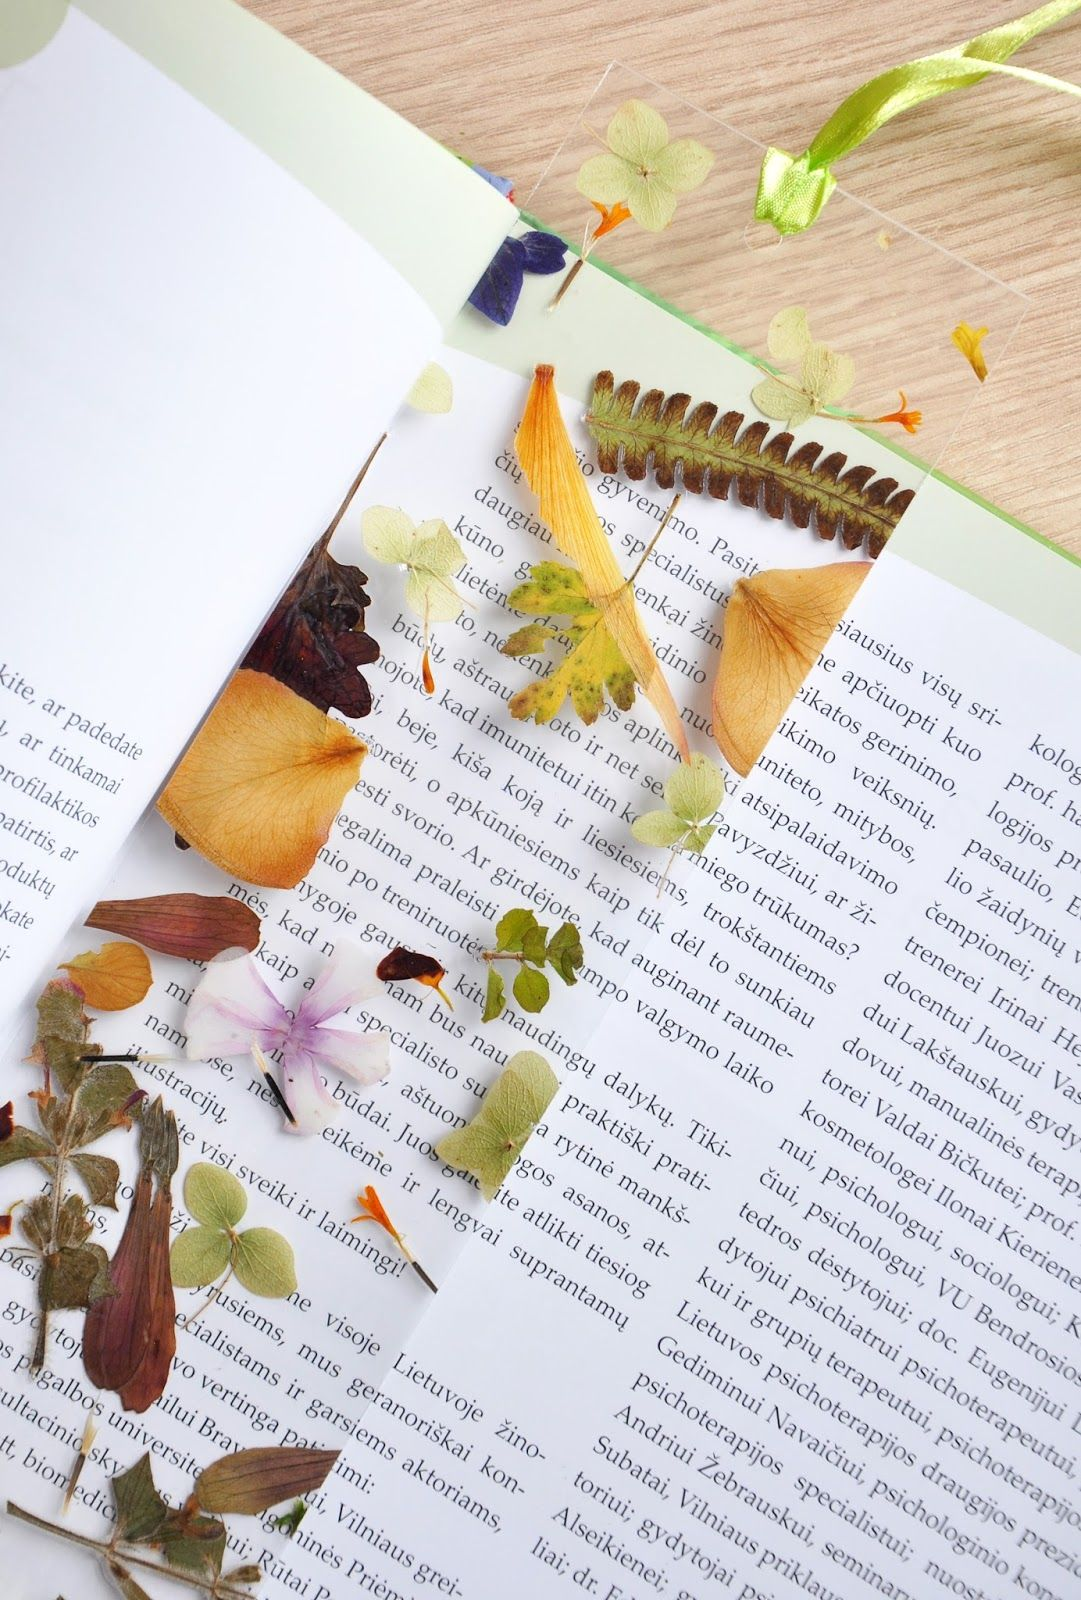 3 Easy Diy Storage Ideas For Small Kitchen: Diy Flower Bookmark …